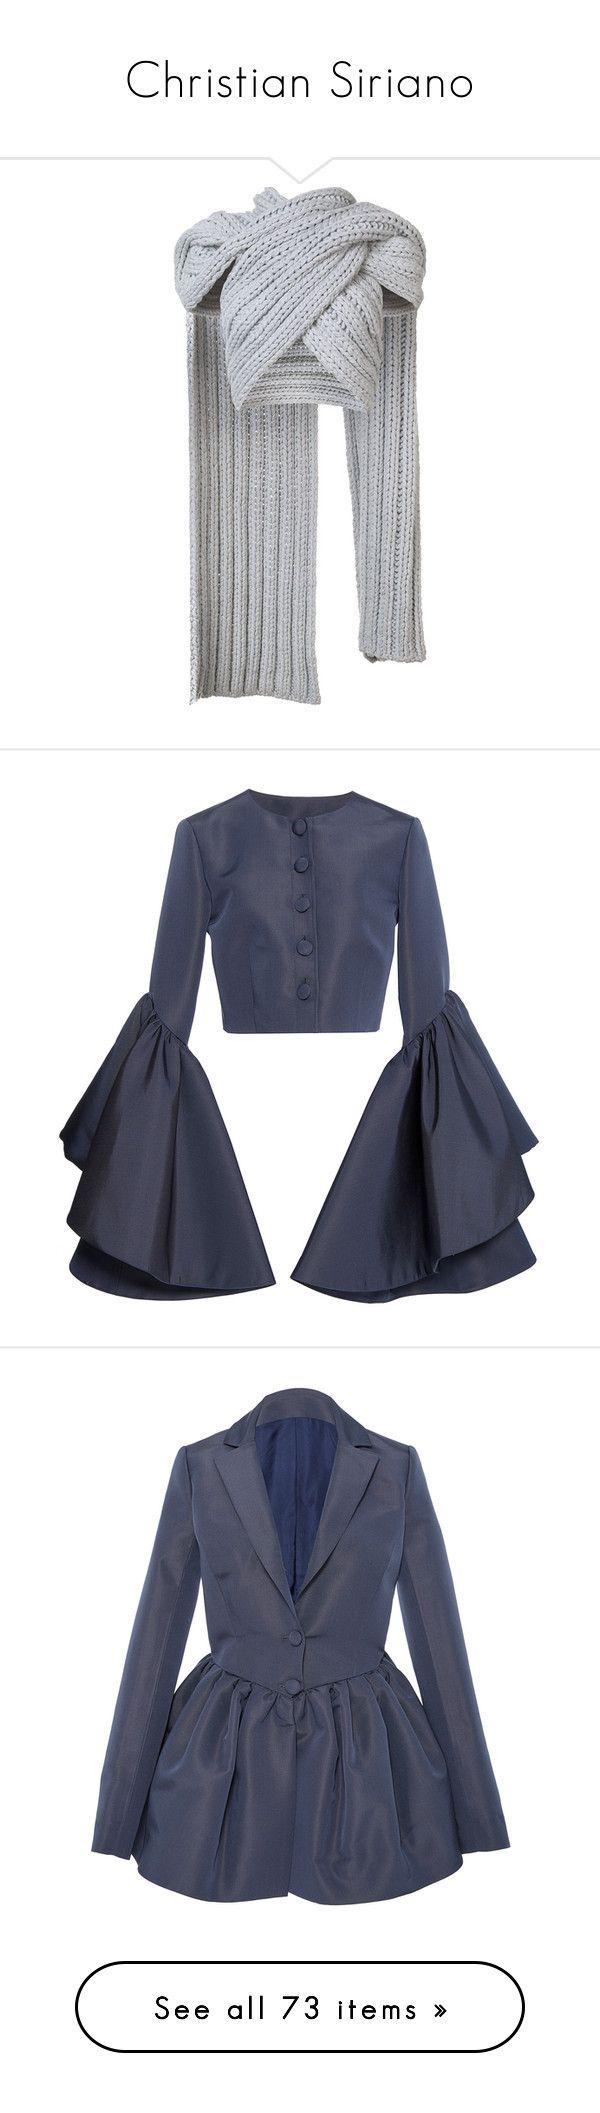 """Christian Siriano"" by mari-sv ❤ liked on Polyvore featuring grey, christian siriano, outerwear, jackets, blazers, blue peplum jacket, peplum blazer jacket, long sleeve blazer, blue peplum blazer and peplum blazer"